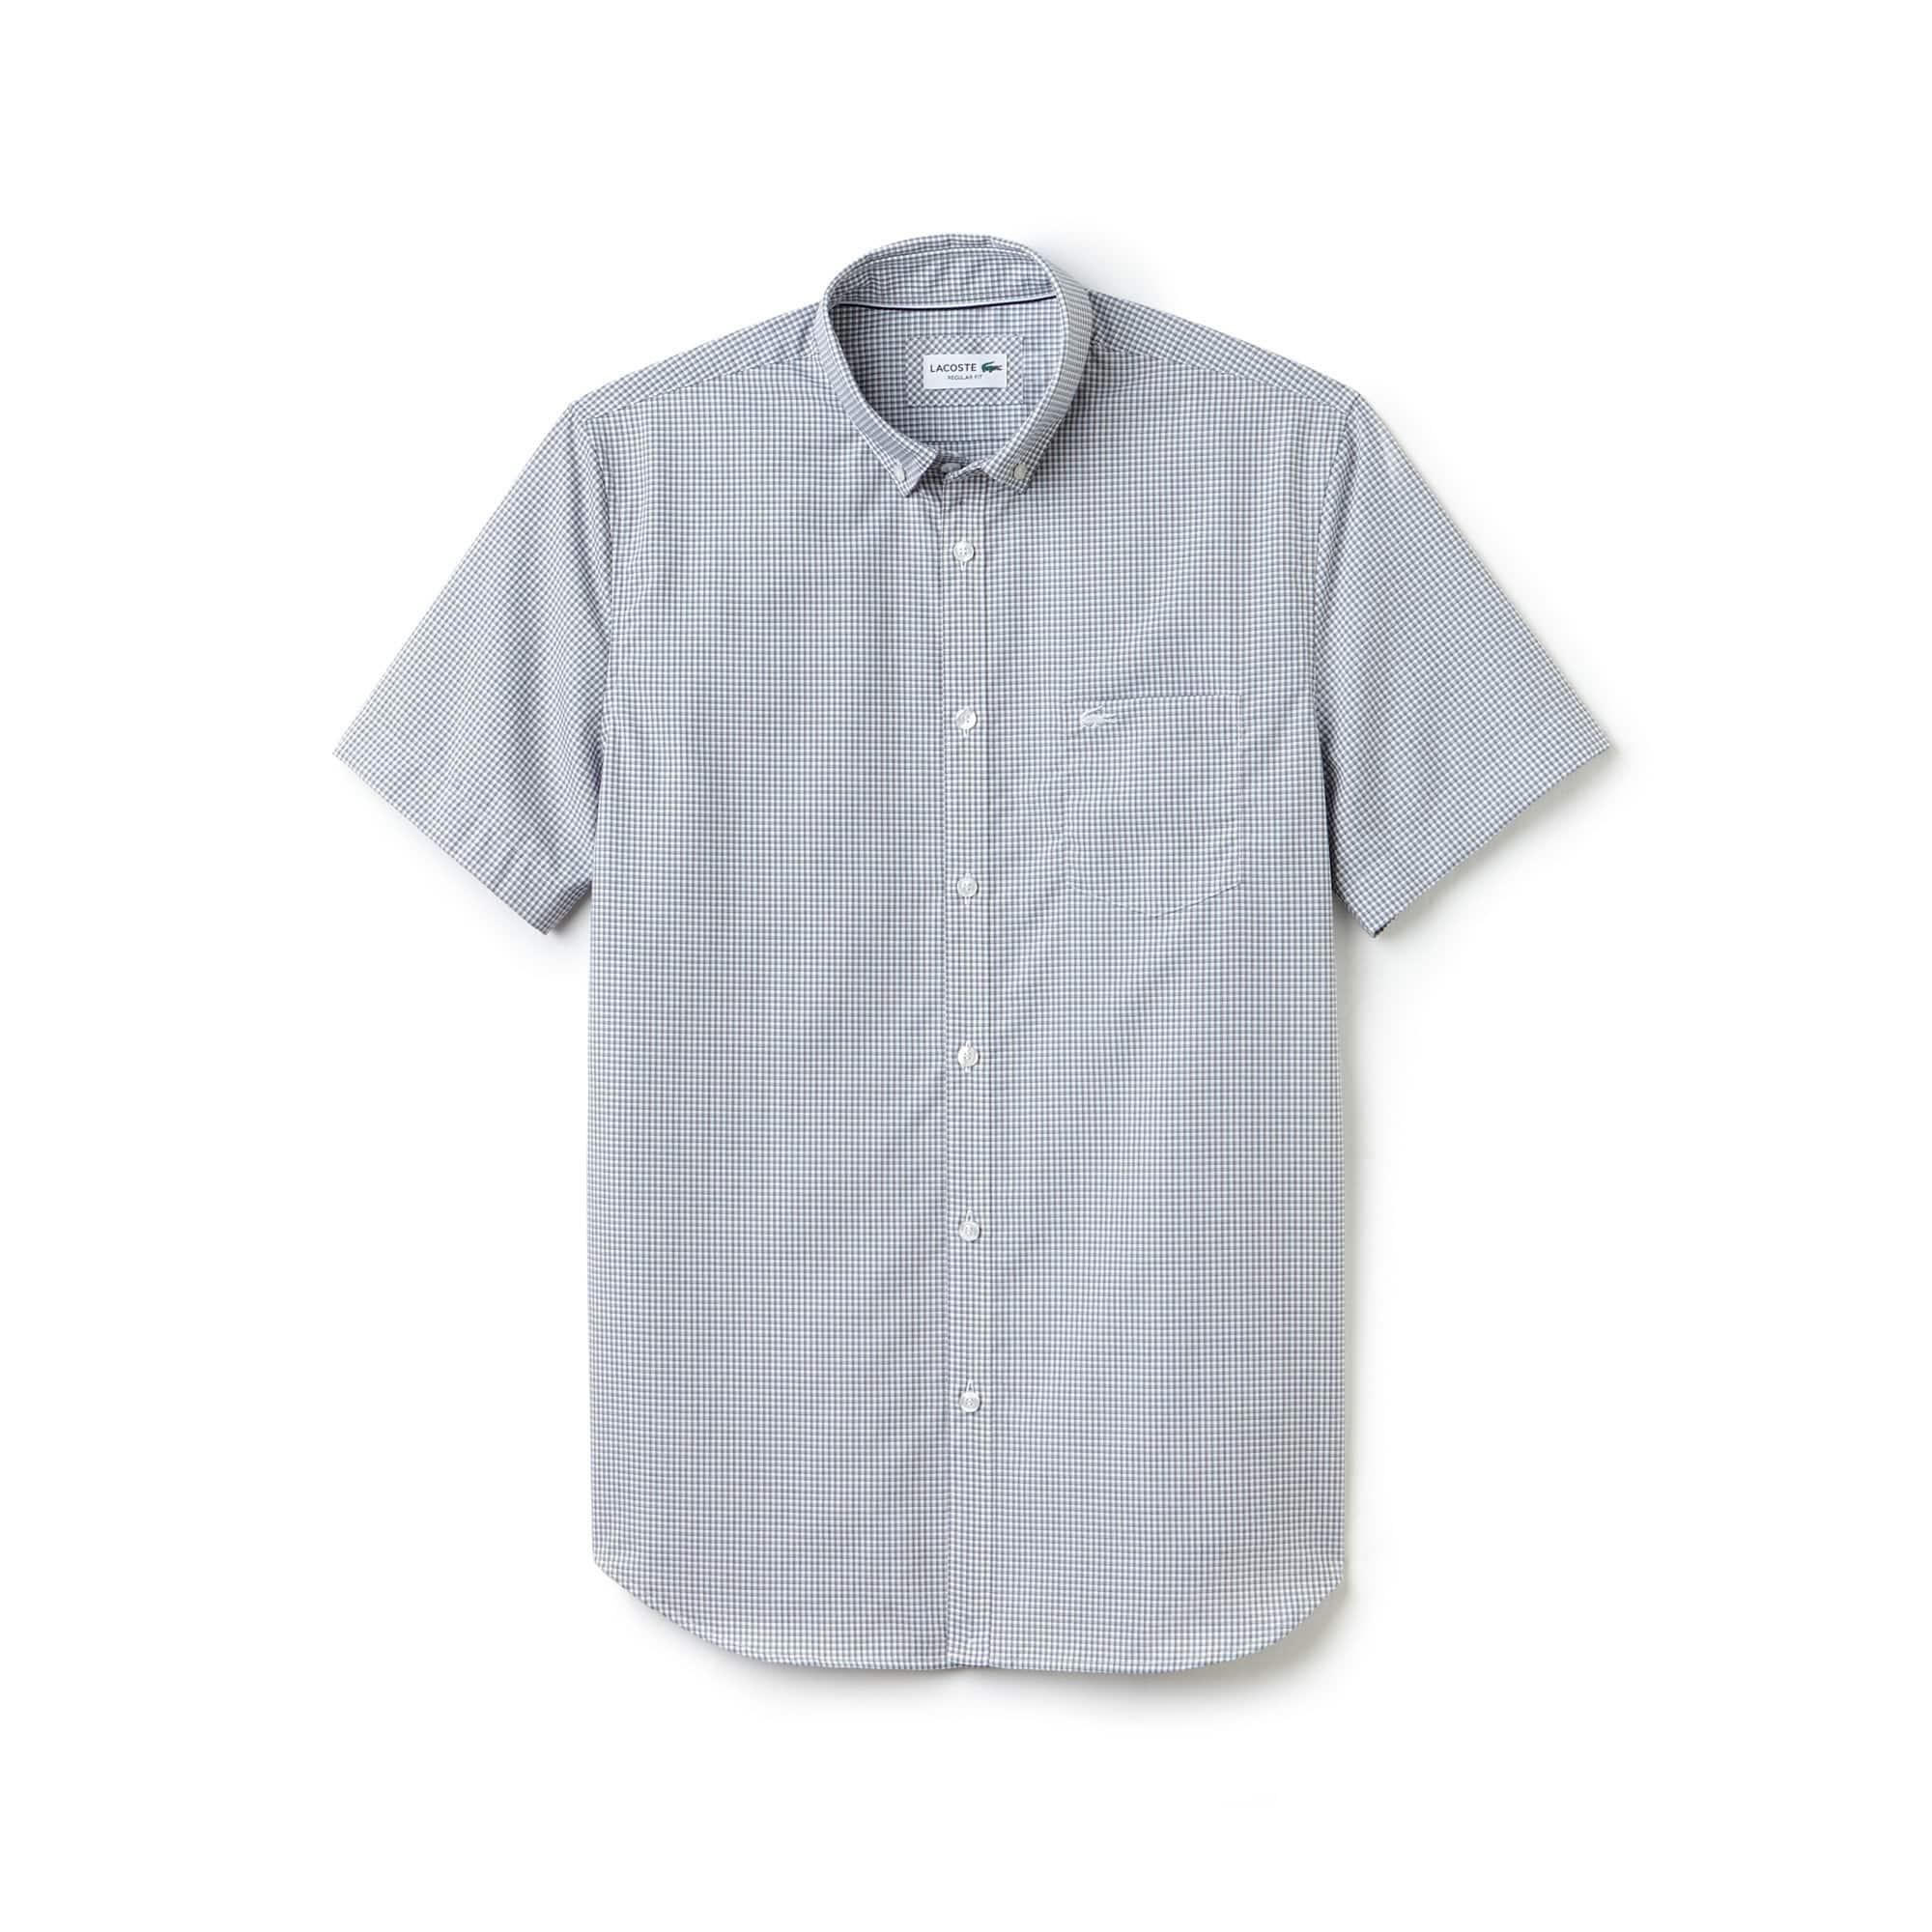 Camicia regular fit a maniche corte in popeline a mini quadretti